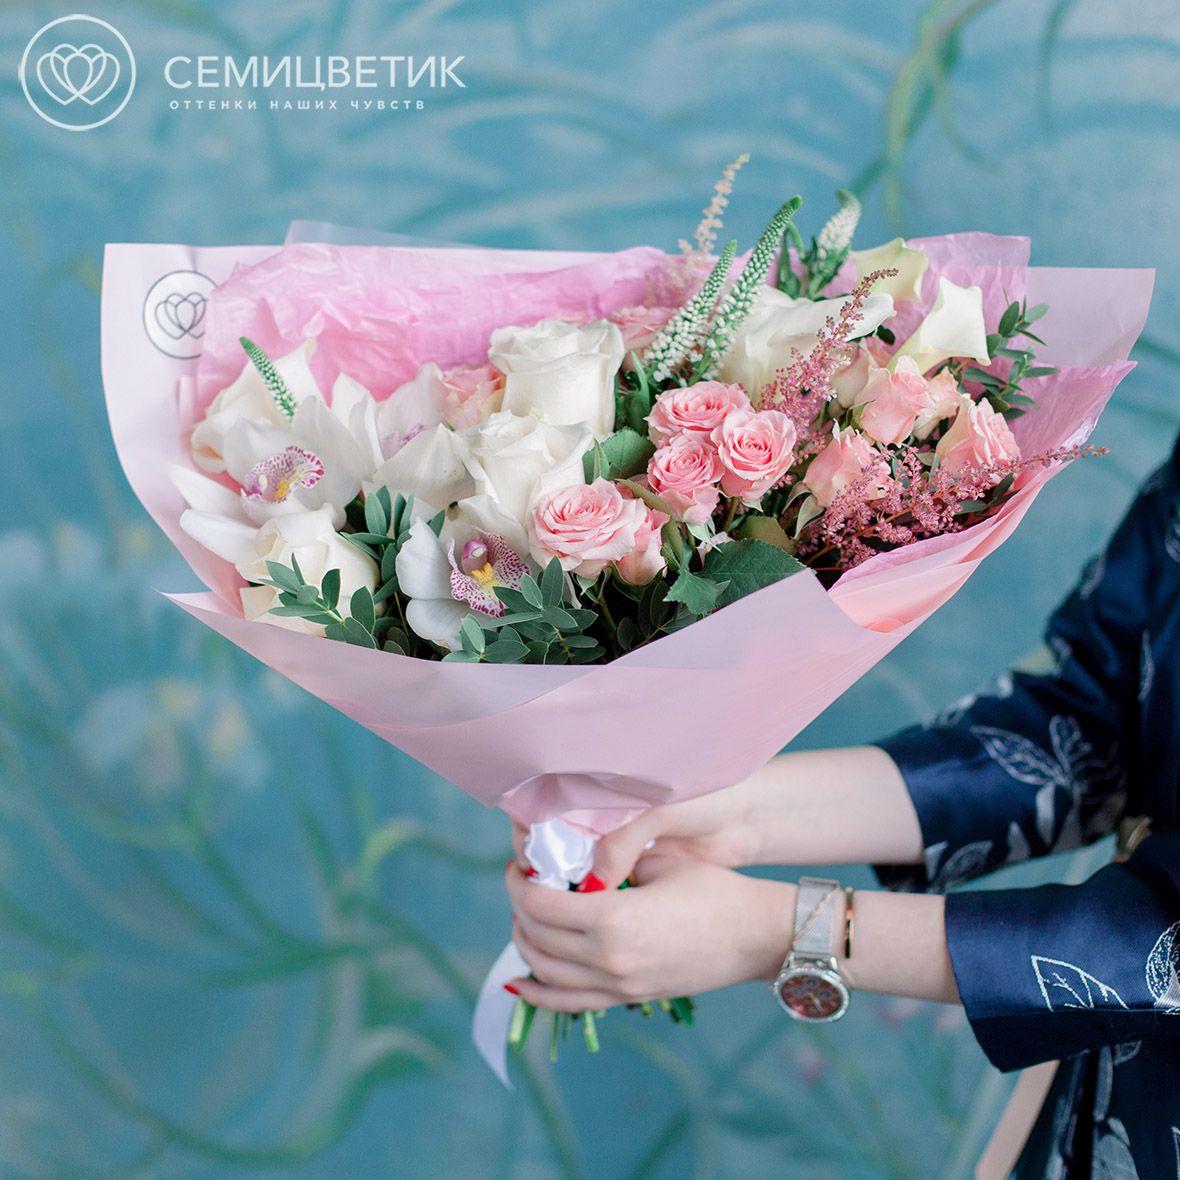 Букет из роз, орхидеи и гвоздики фото